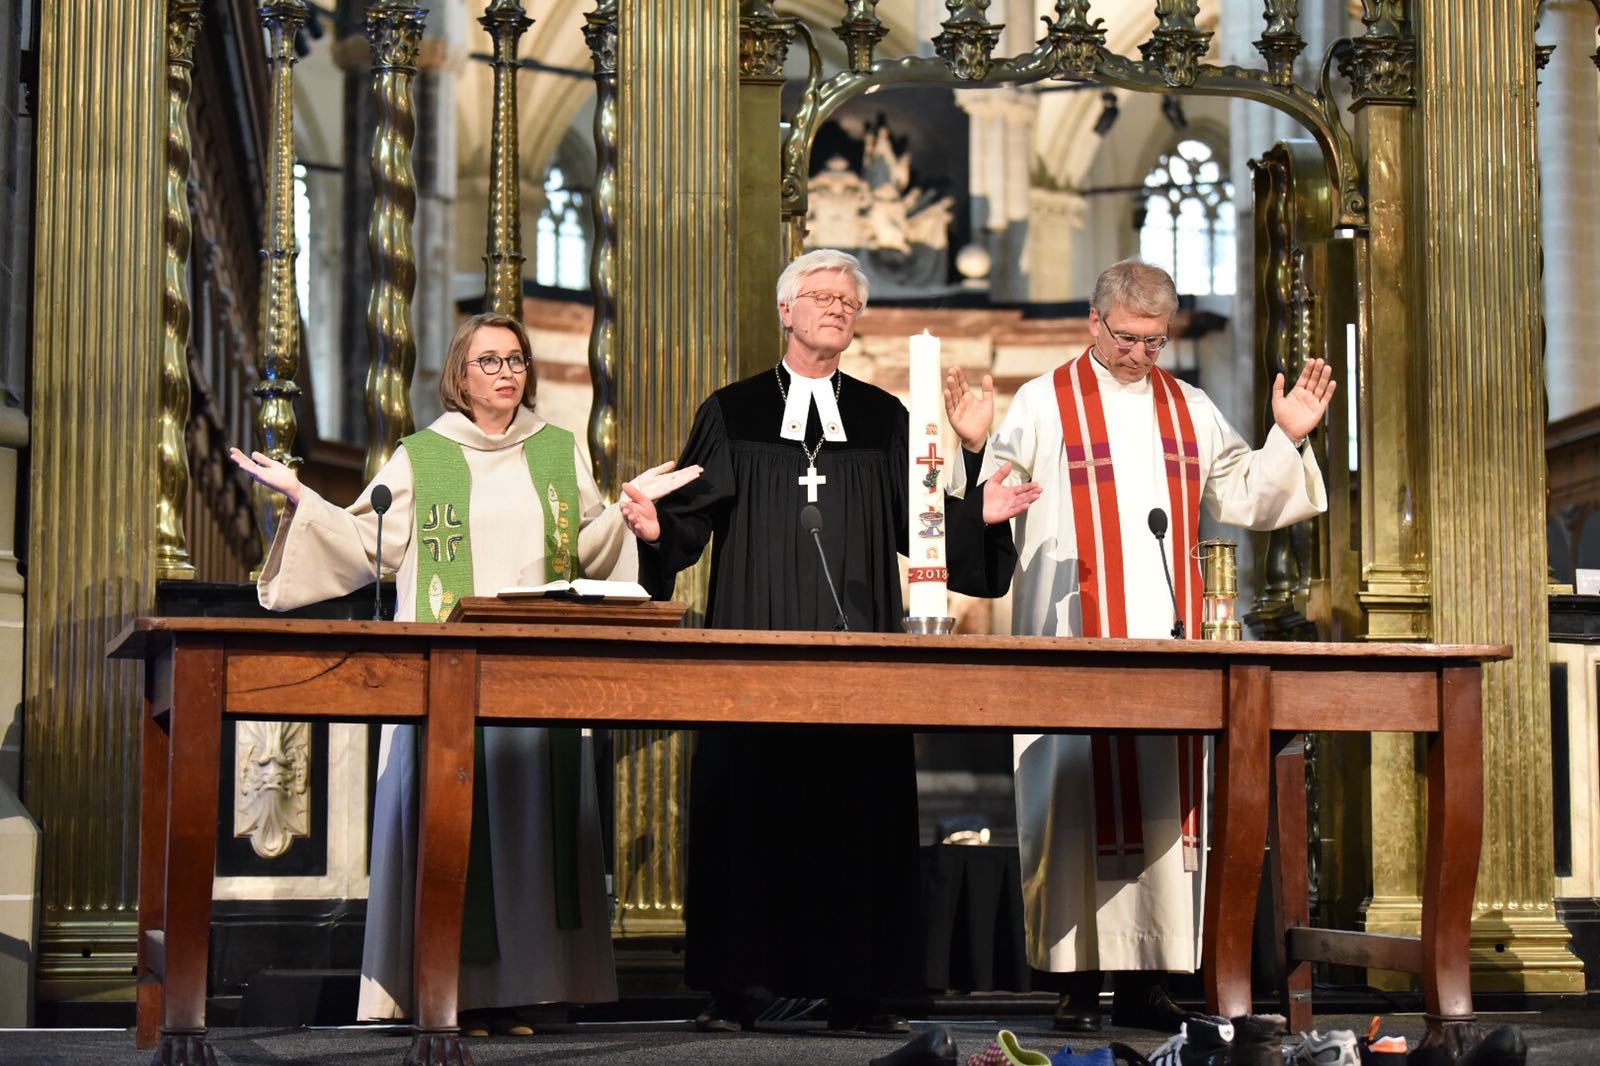 Rev.-Margarithe-Veen-Bishop-Dr-Heinrich-Bedford-Strohm-and-Rev.-Dr-Olav-Fykse-Tveit-in-ecumenical-prayer-service-at-the-Nieuwe-Kerk-in-Amsterdam.-Photo-Albin-HillertWCC